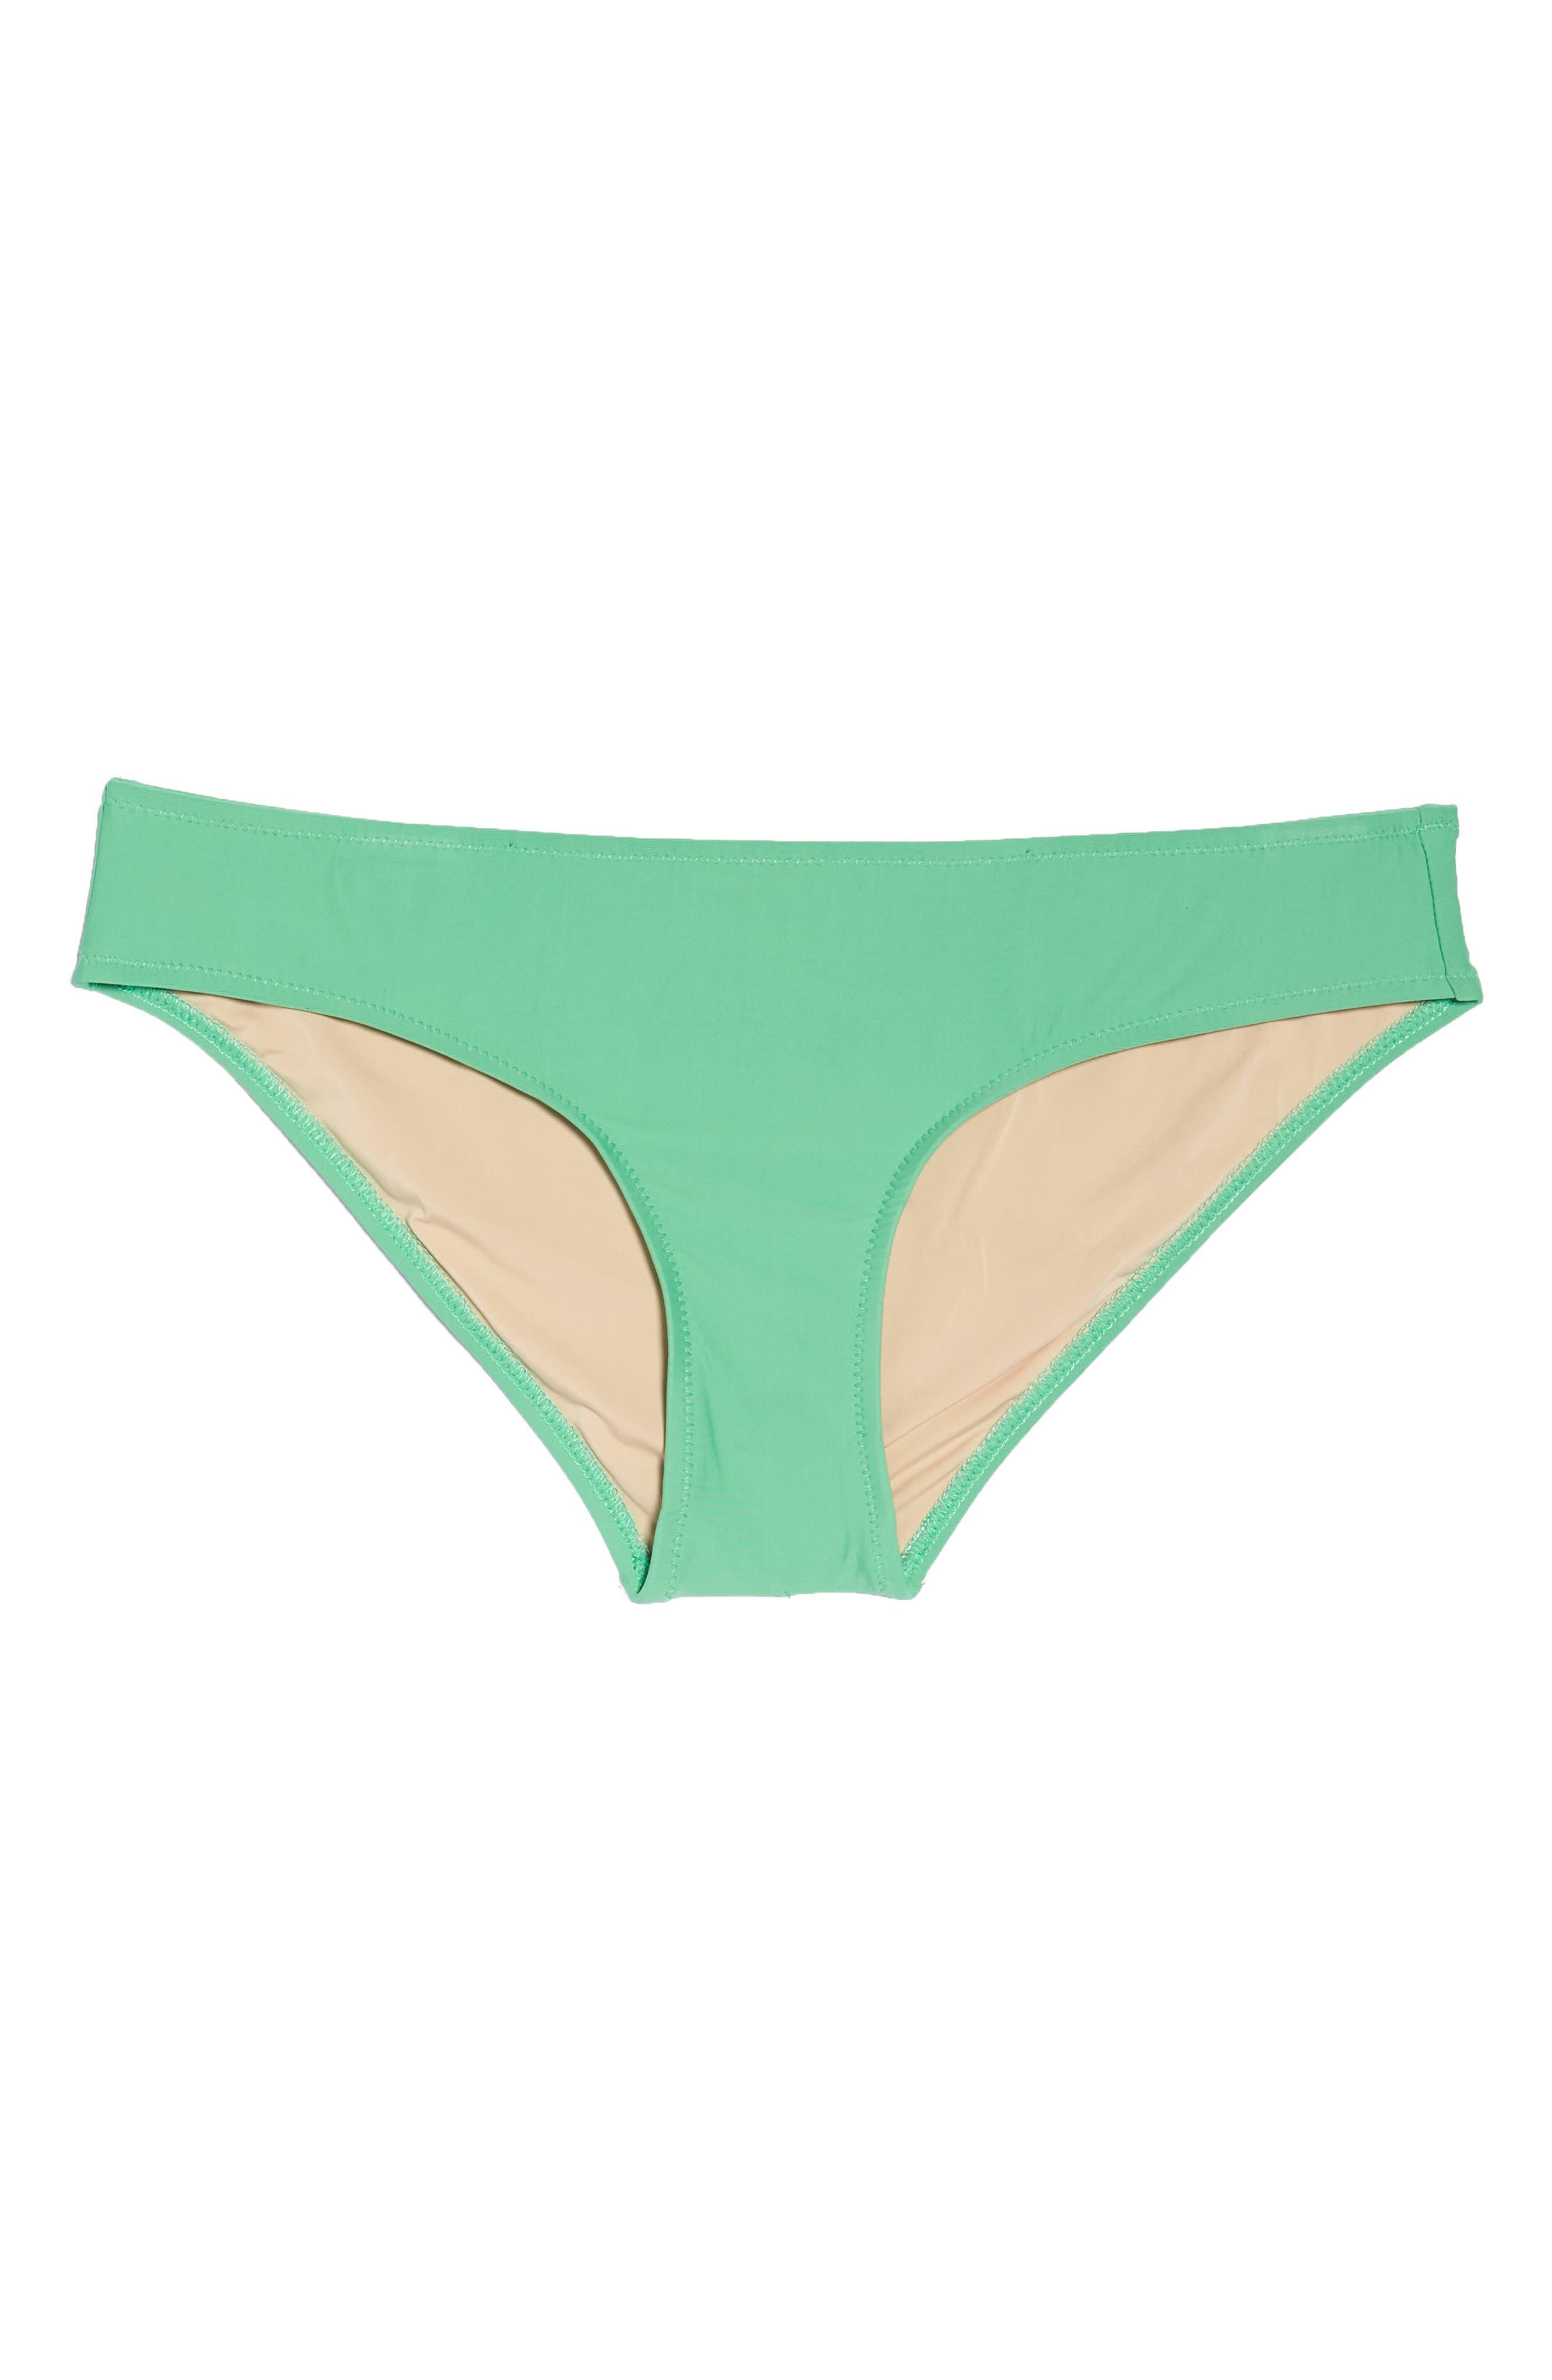 Hipster Bikini Bottoms,                             Alternate thumbnail 38, color,